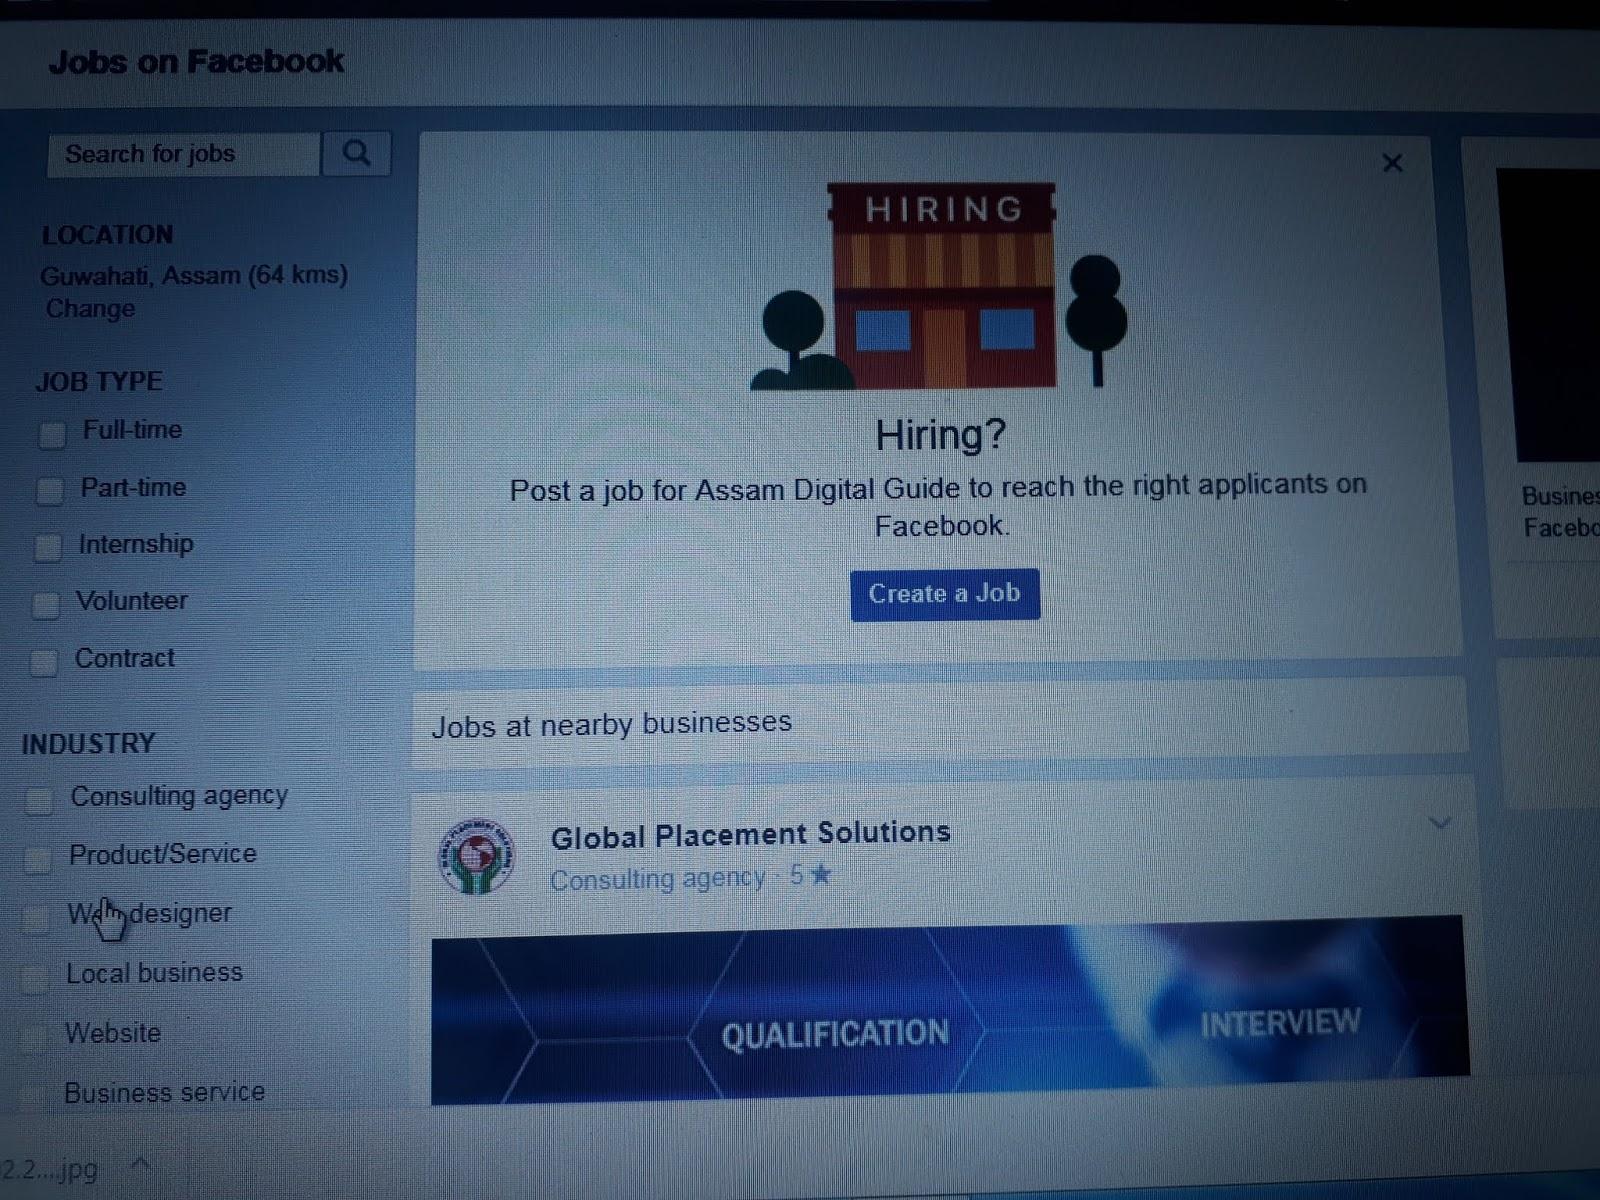 How to get job updates from facebook - Assam Digital Guide